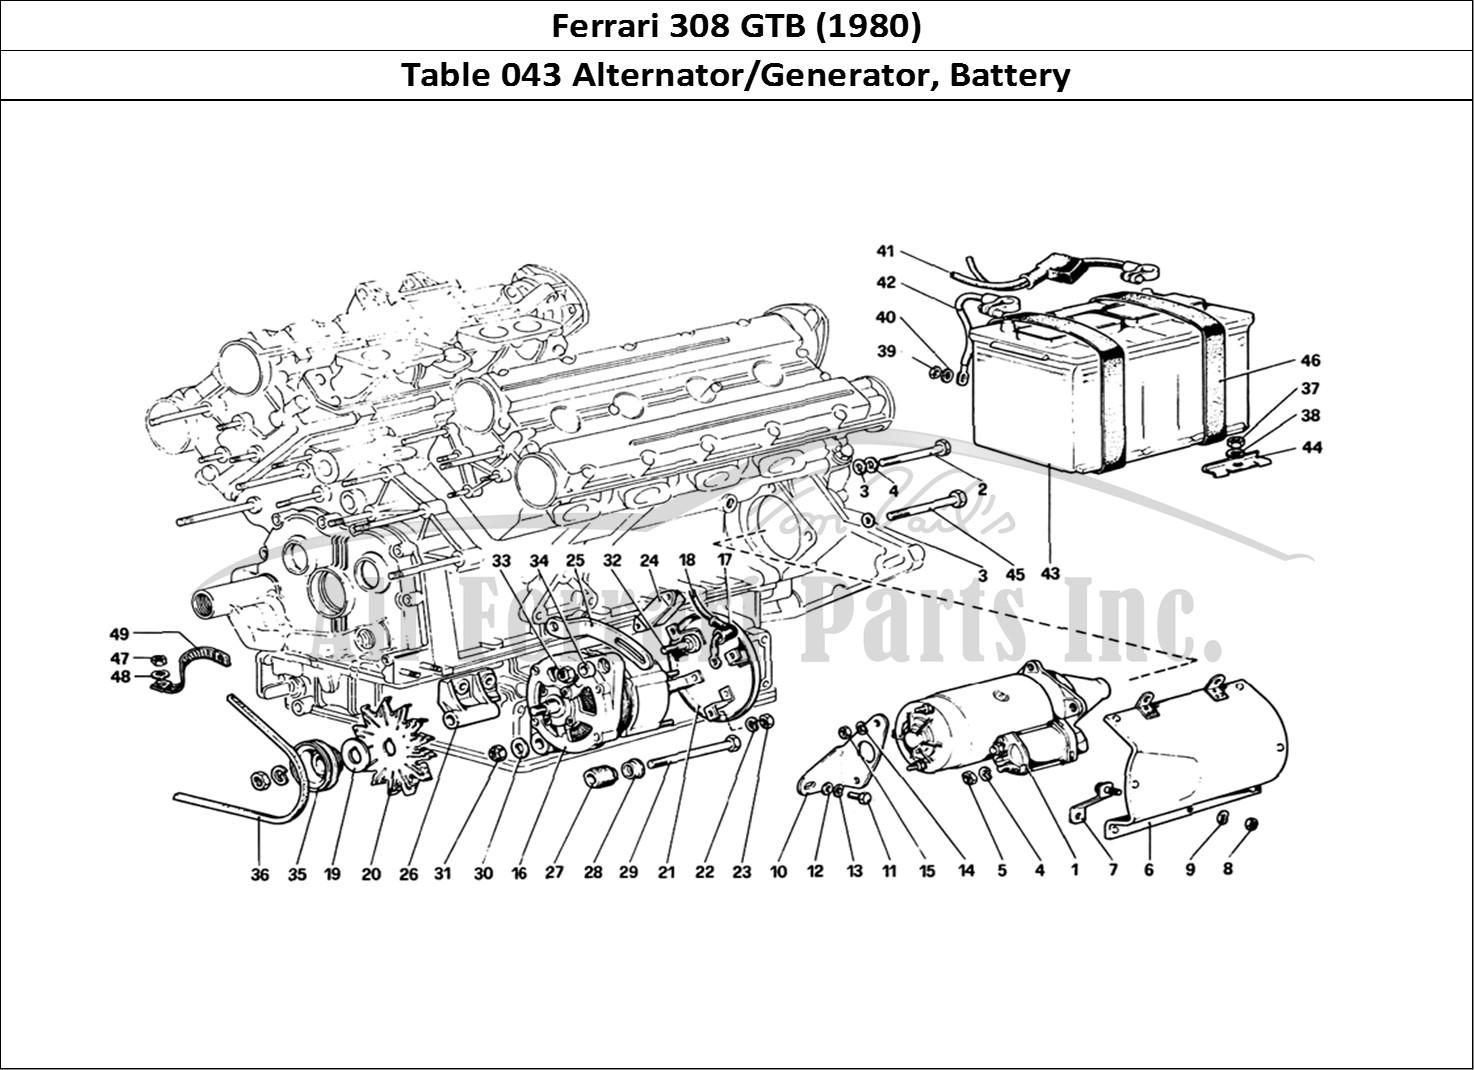 Buy original Ferrari 308 GTB (1980) 043 Alternator